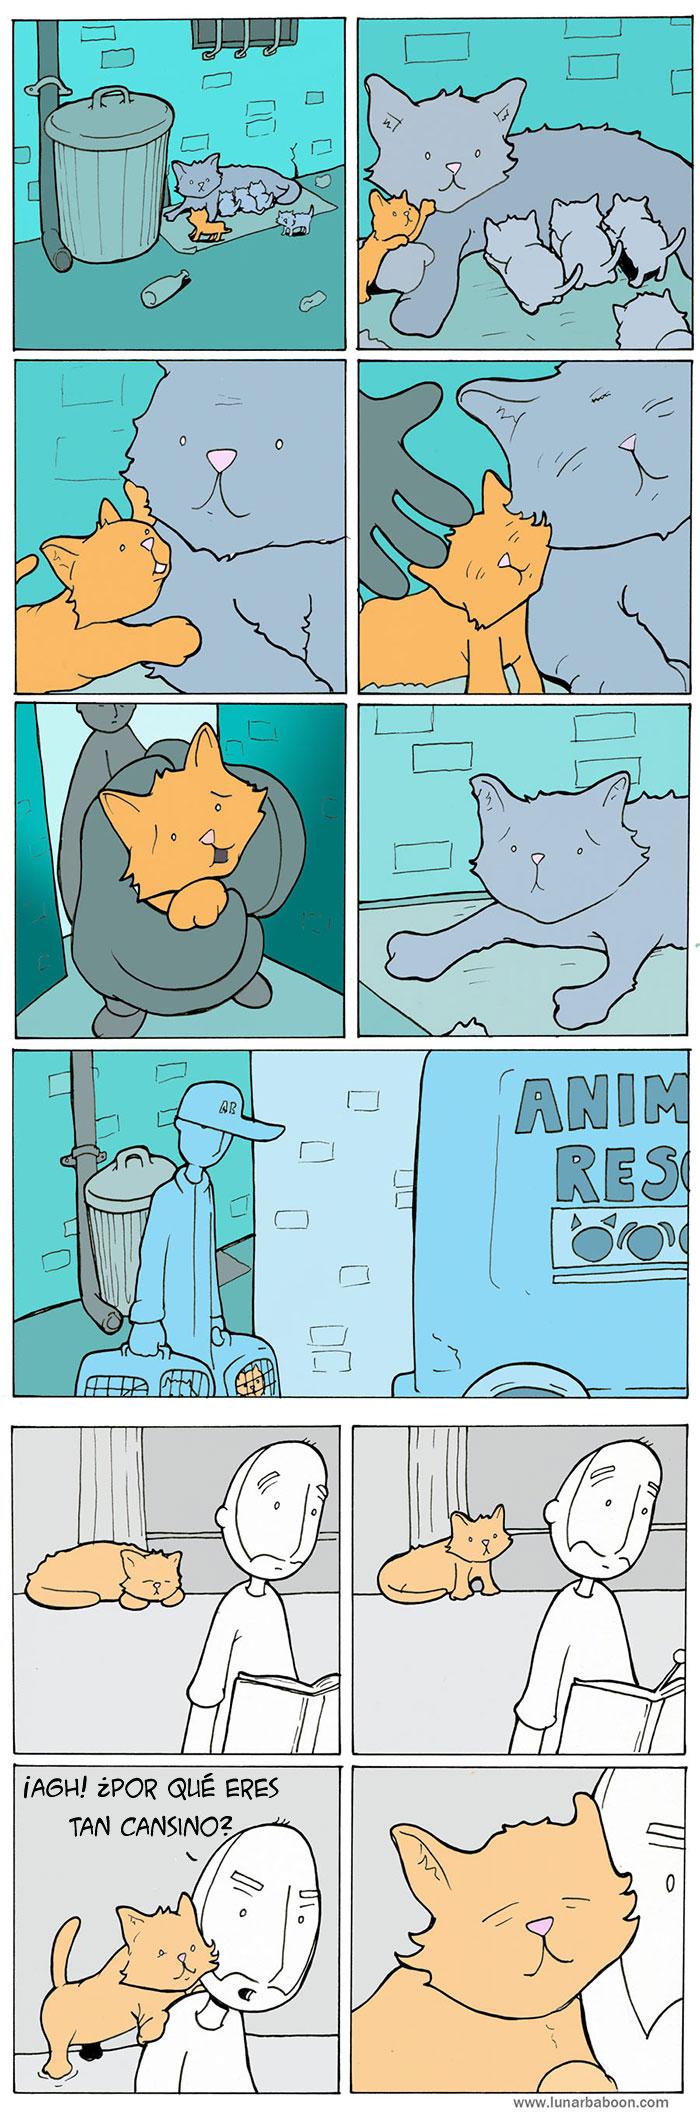 la vida con un gato 9